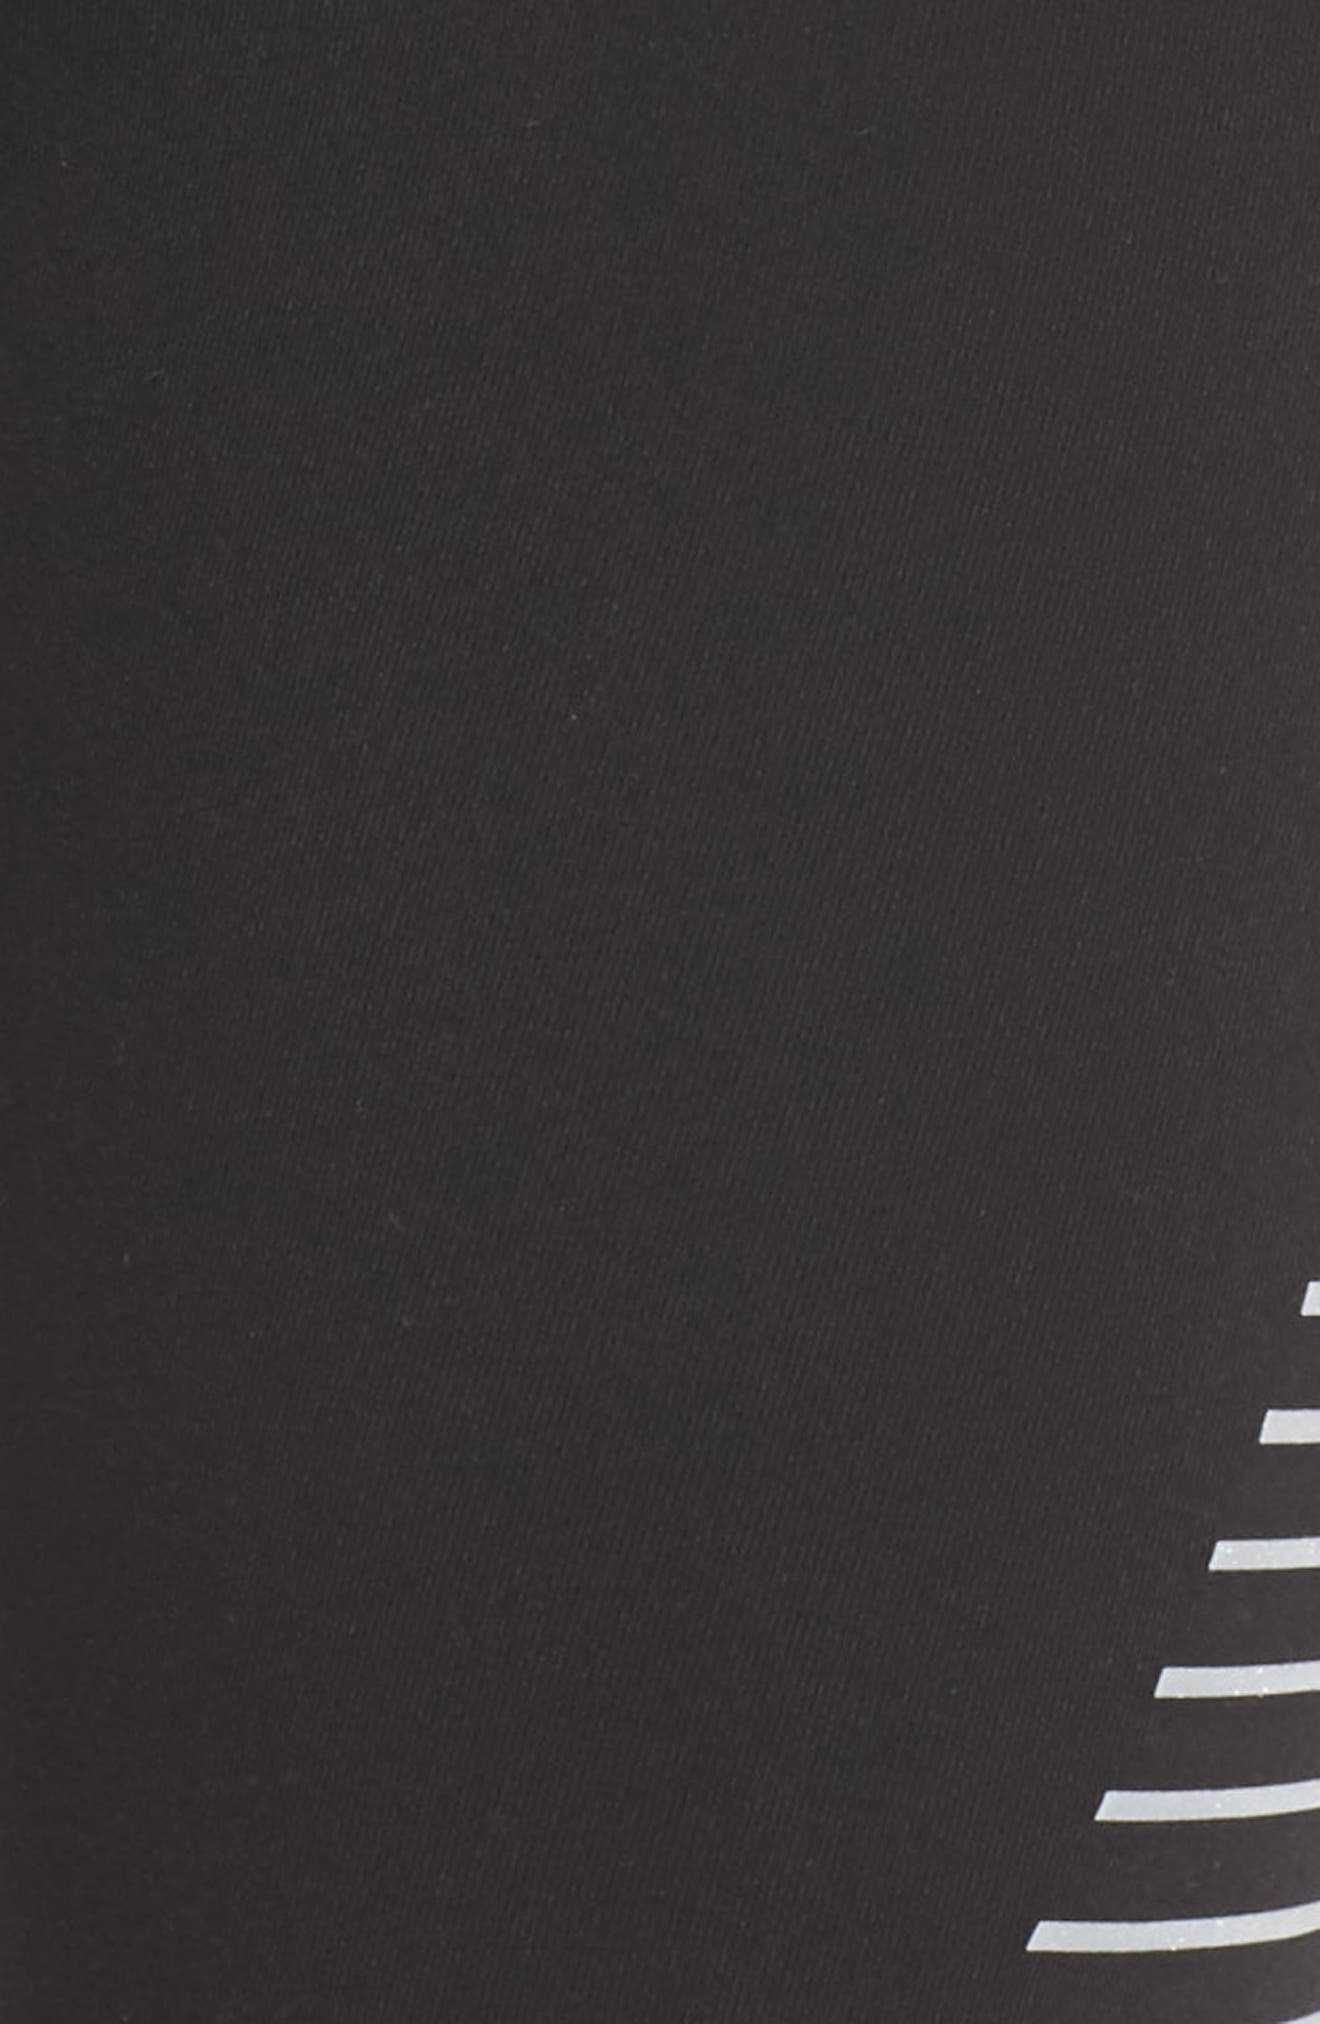 'Airbrushed' Leggings,                             Alternate thumbnail 4, color,                             Black Reflector